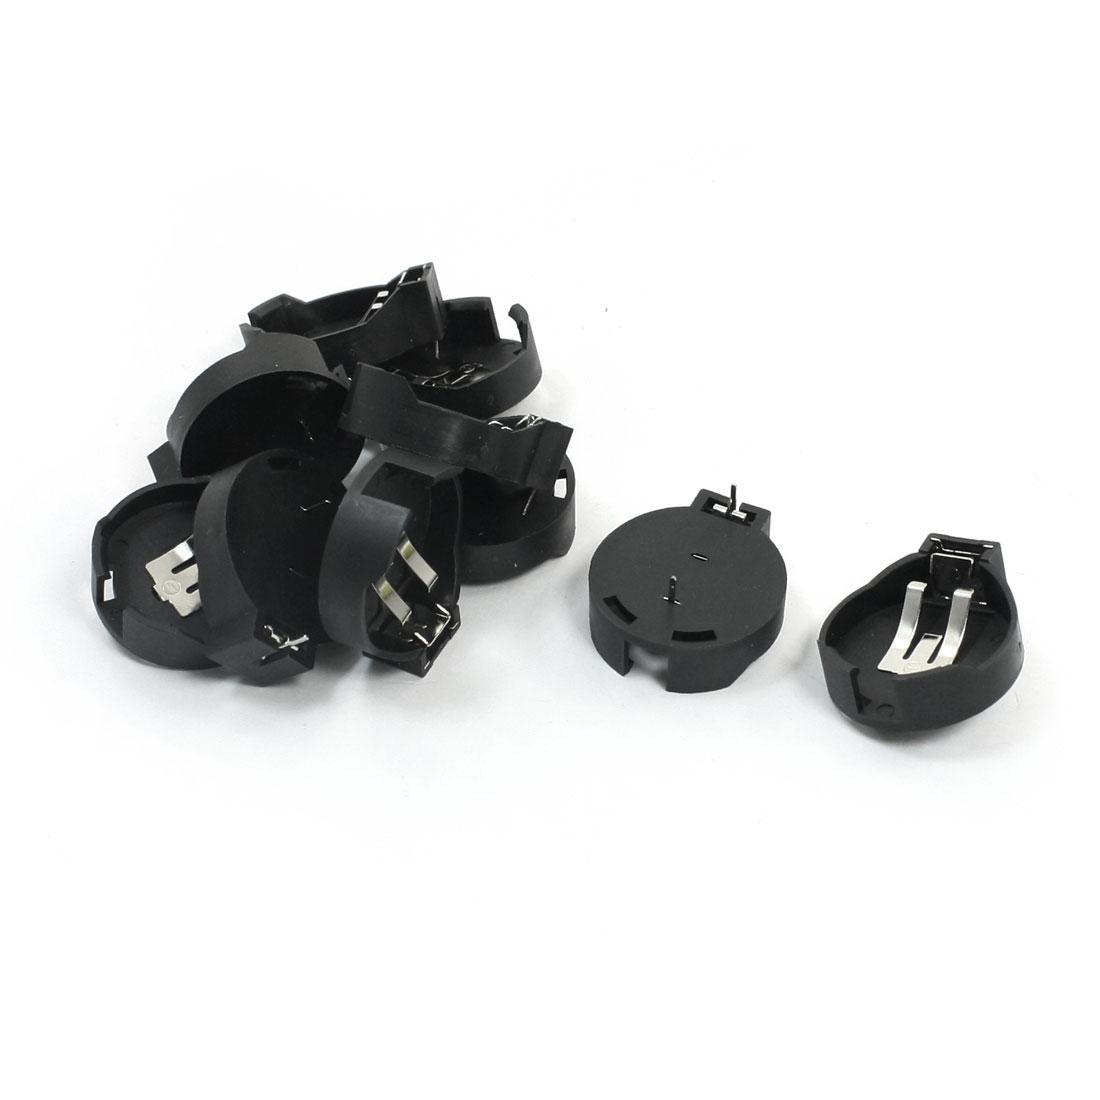 10 Pcs Black Plastic Lithium Coin Cell Button Battery Holder Socket Black for CR2477 Batteries